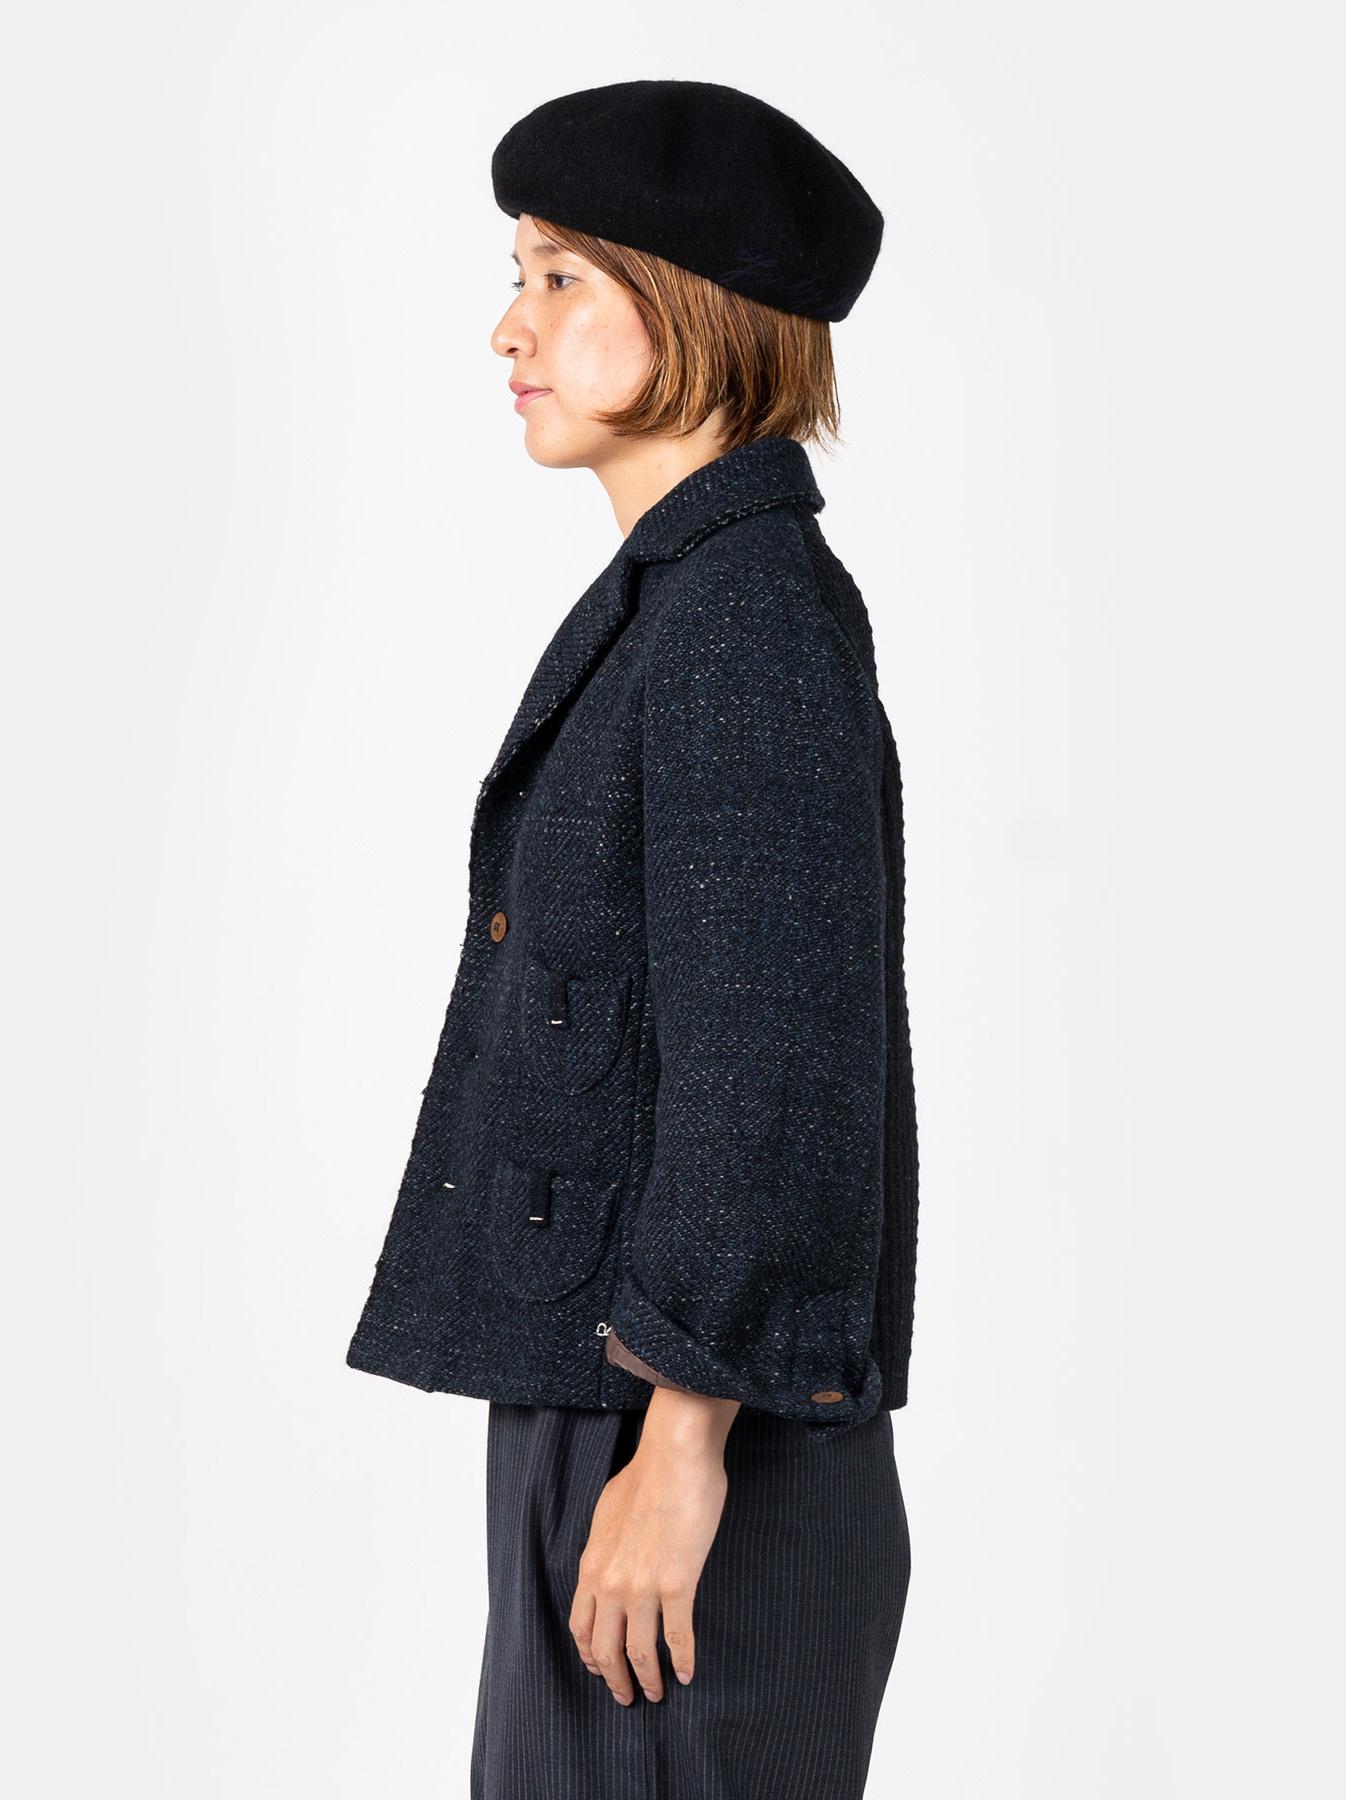 Mixed Tweed Knit Jacket-4